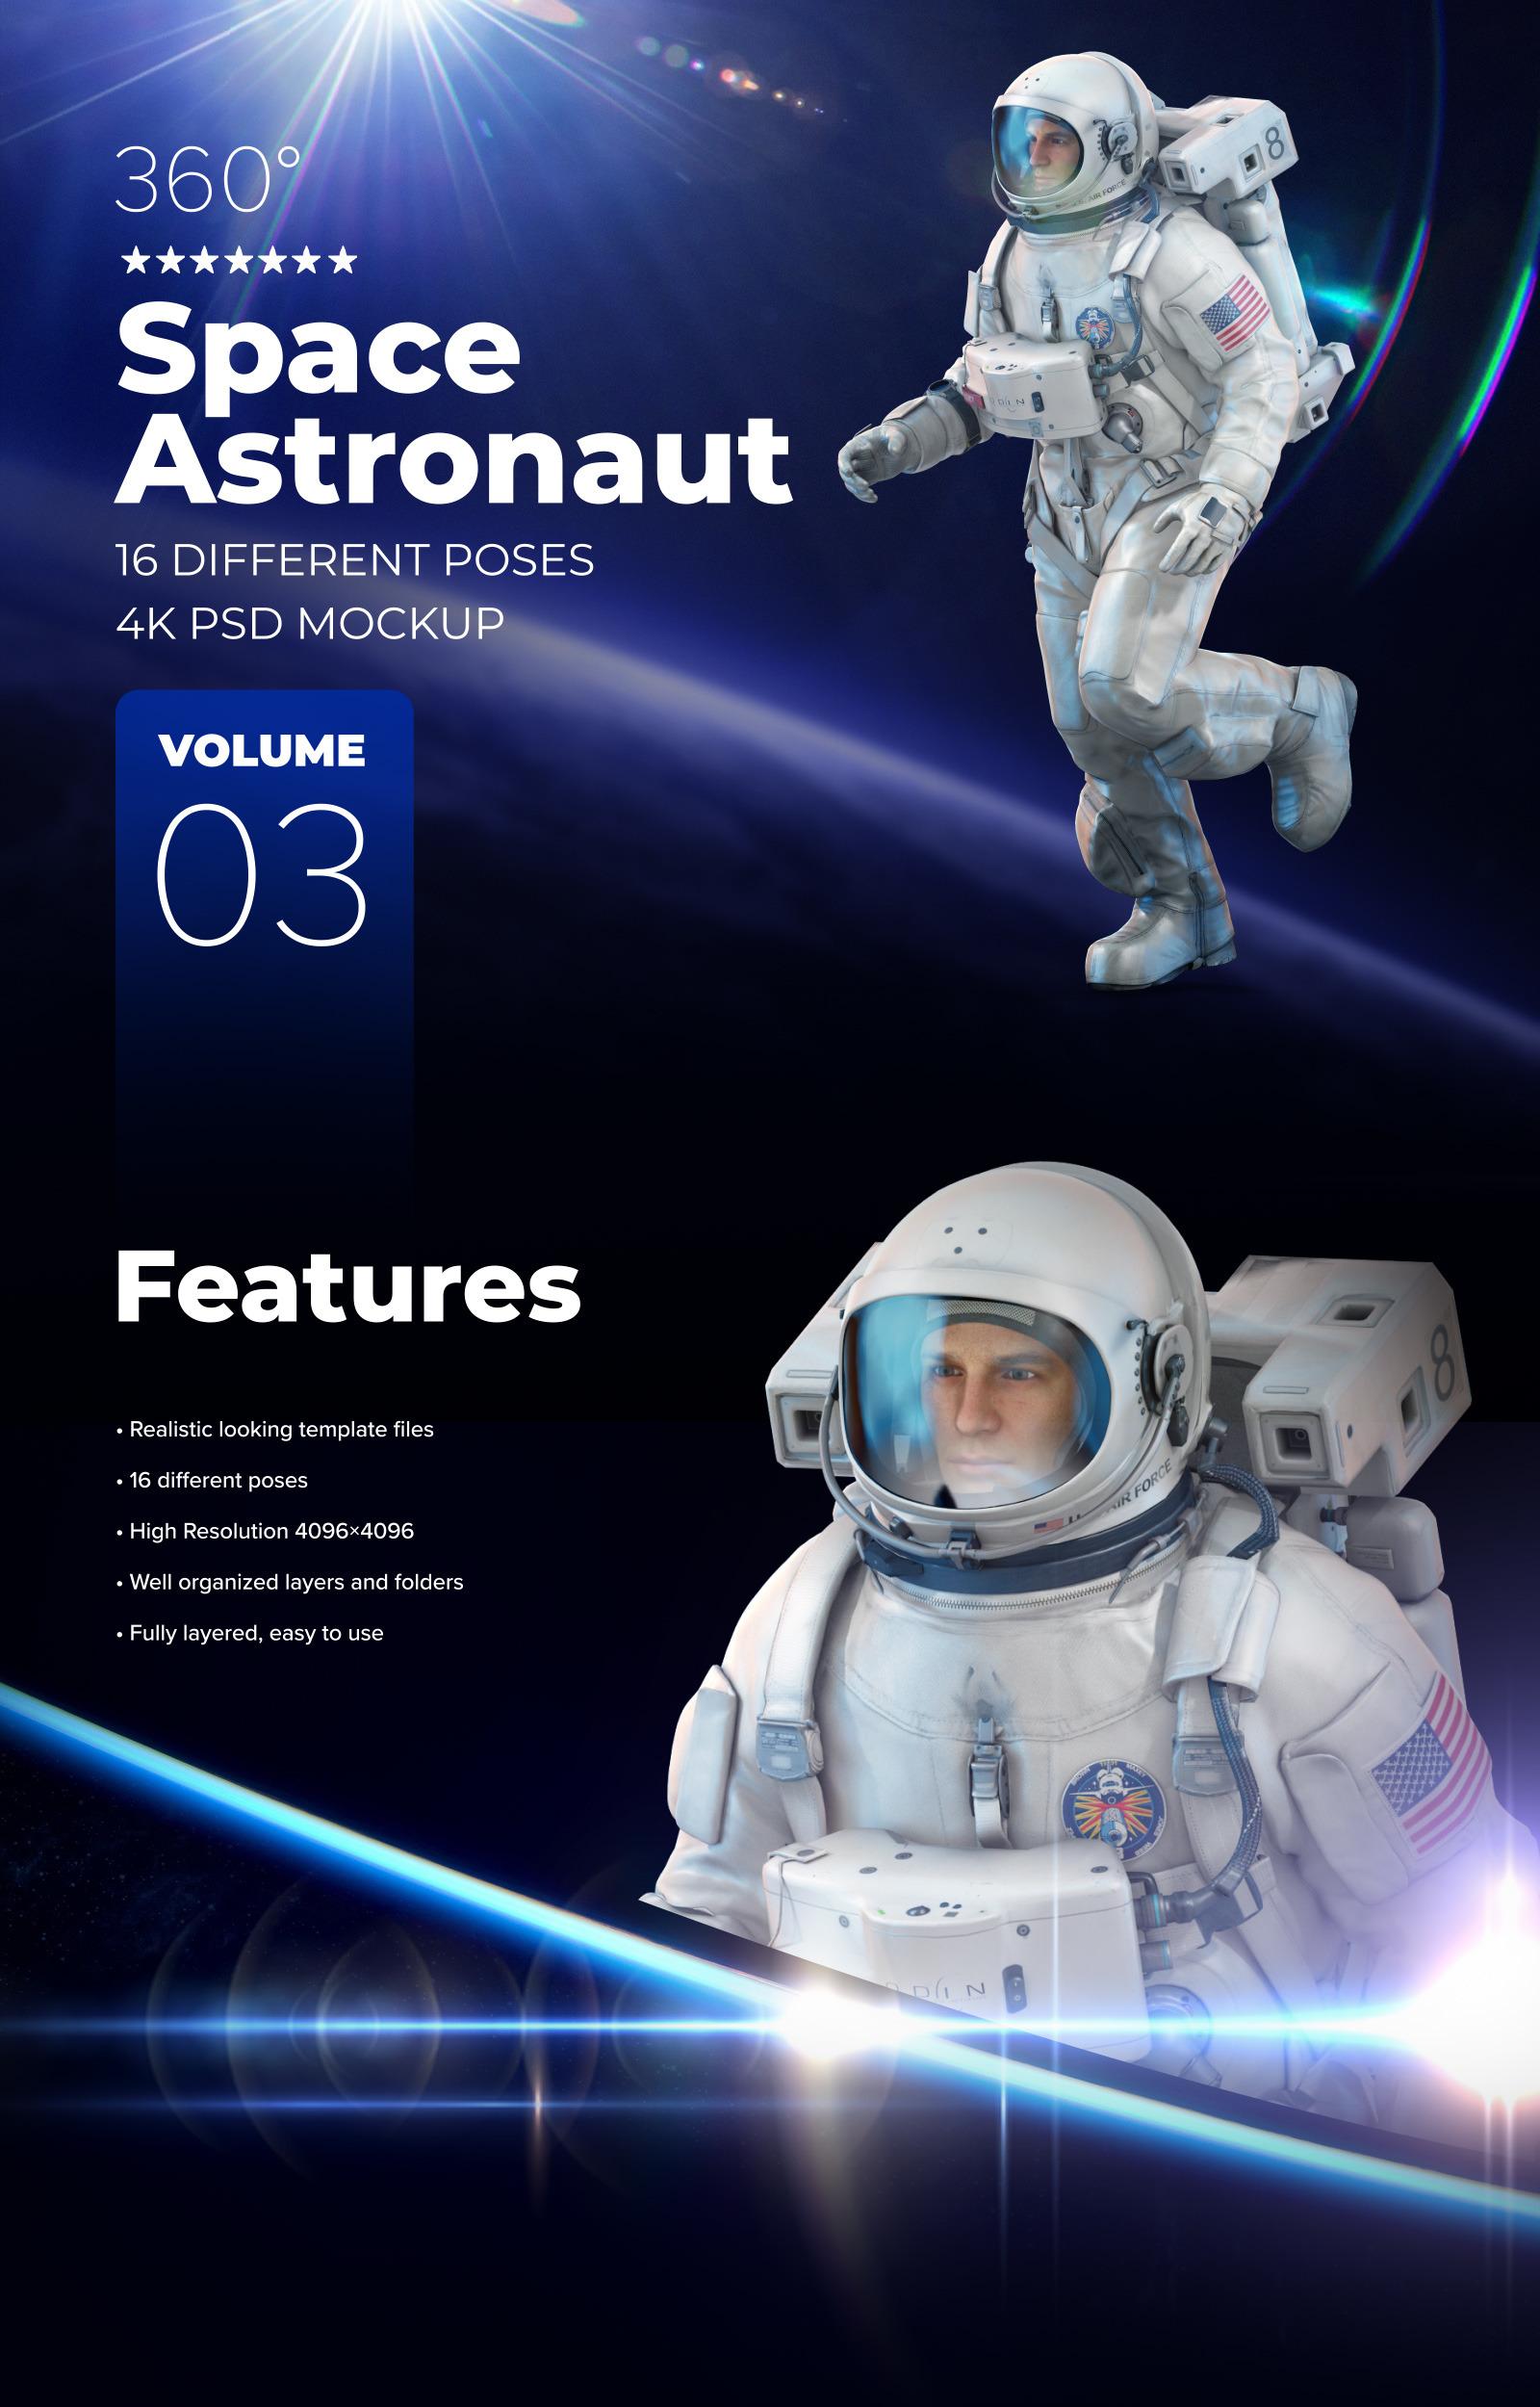 3D Mockup Space Astronaut #03